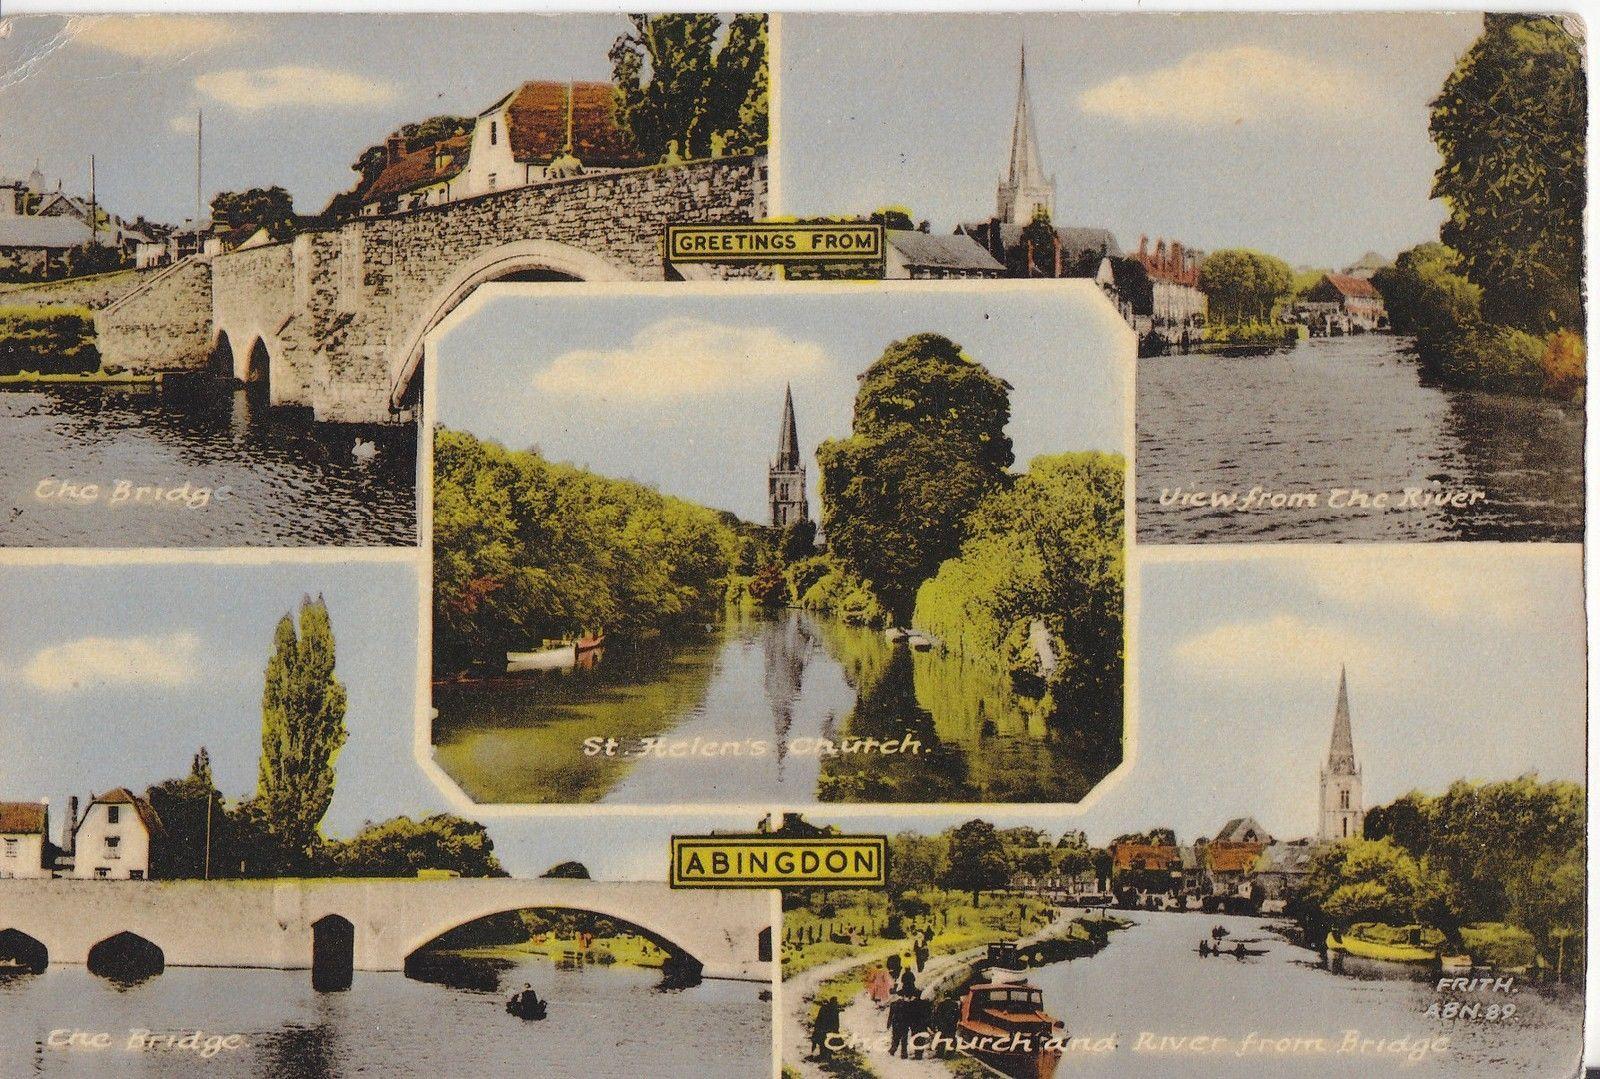 ABINGDON NICE OLD 5 VIEW COLOUR POSTCARD FRITHS NO ABN 89. | eBay